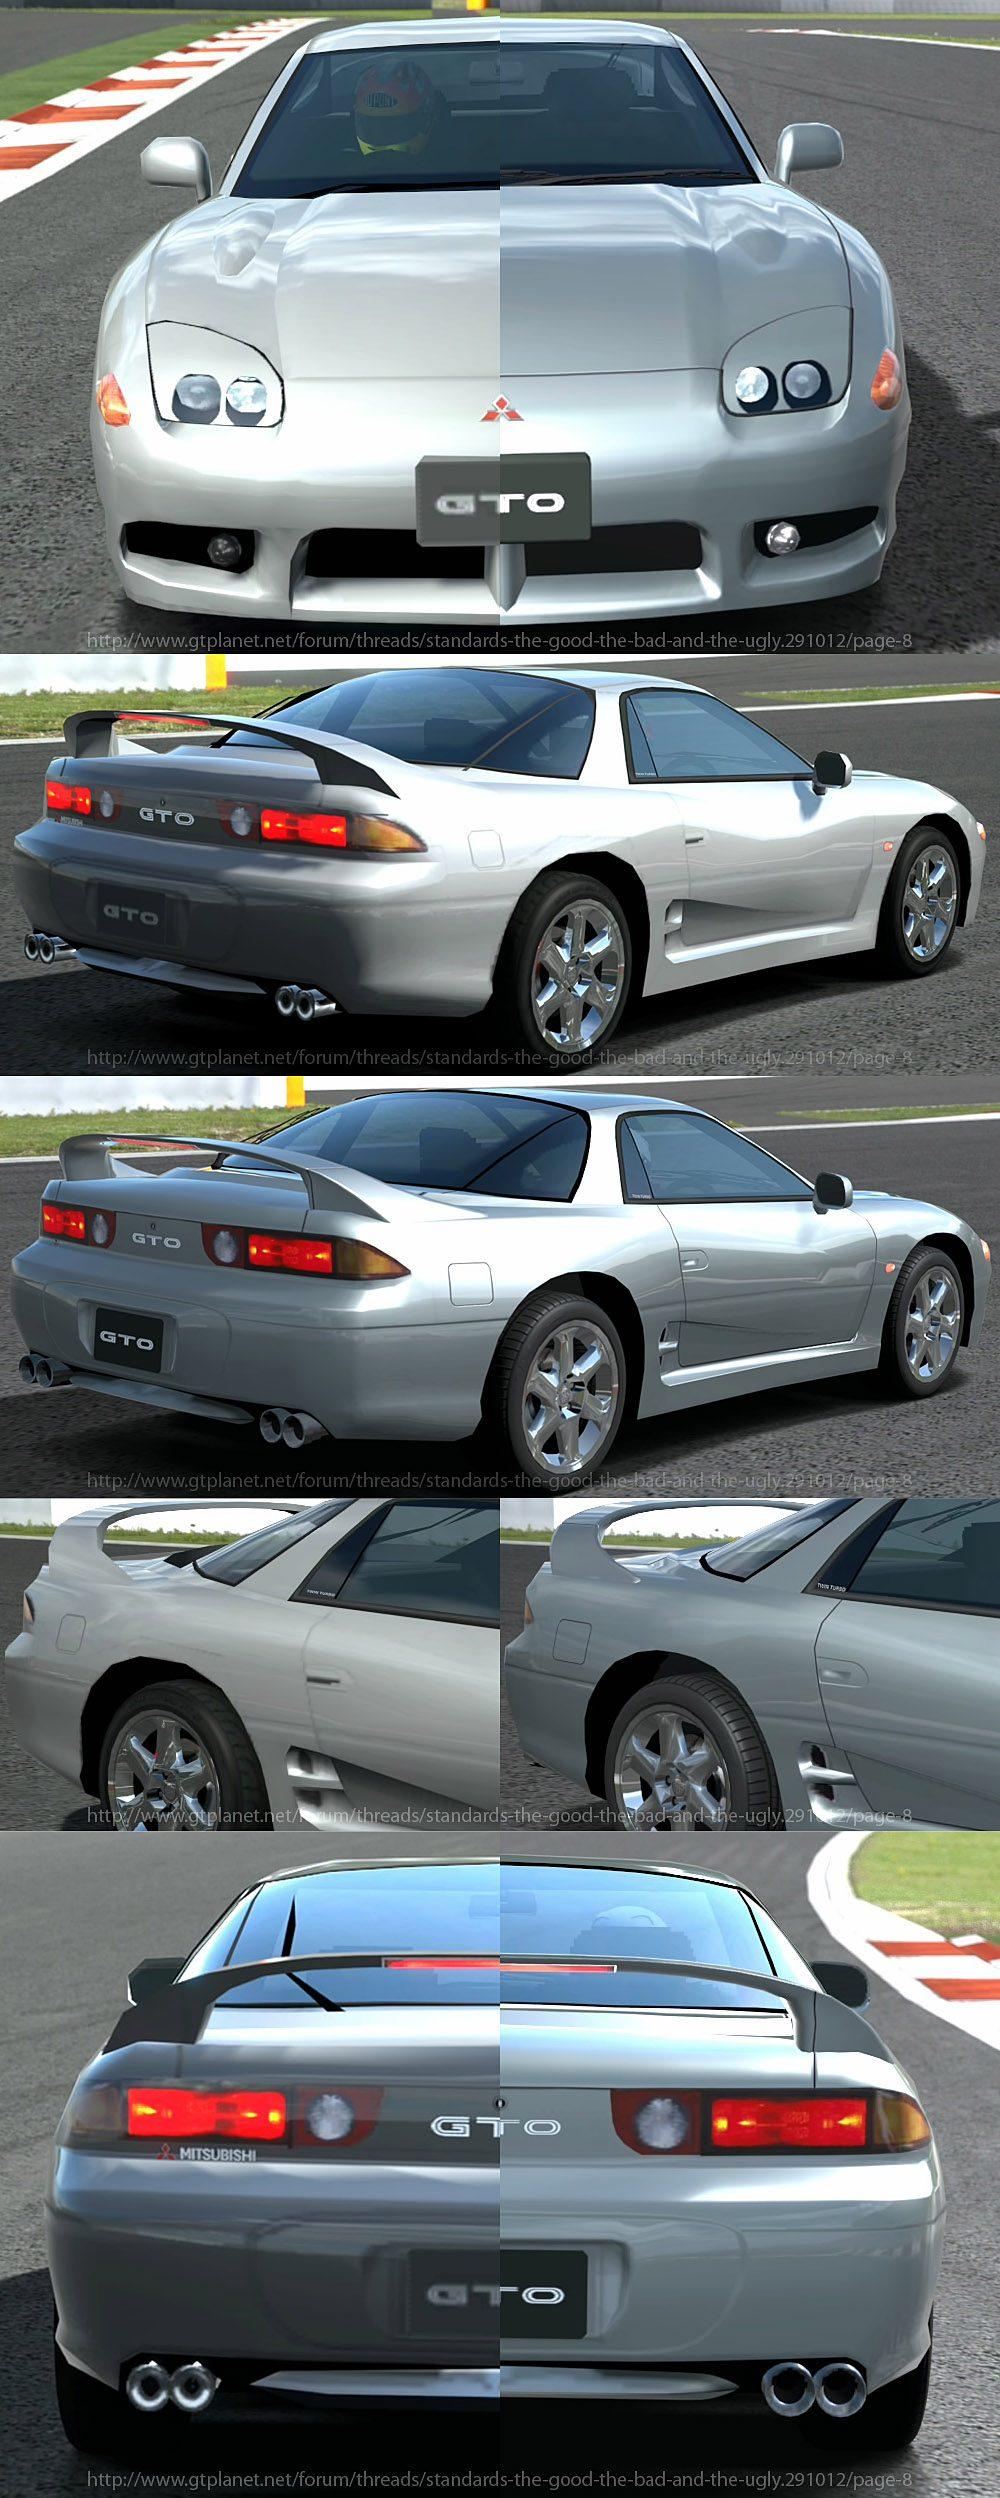 GTO-96_021.jpg